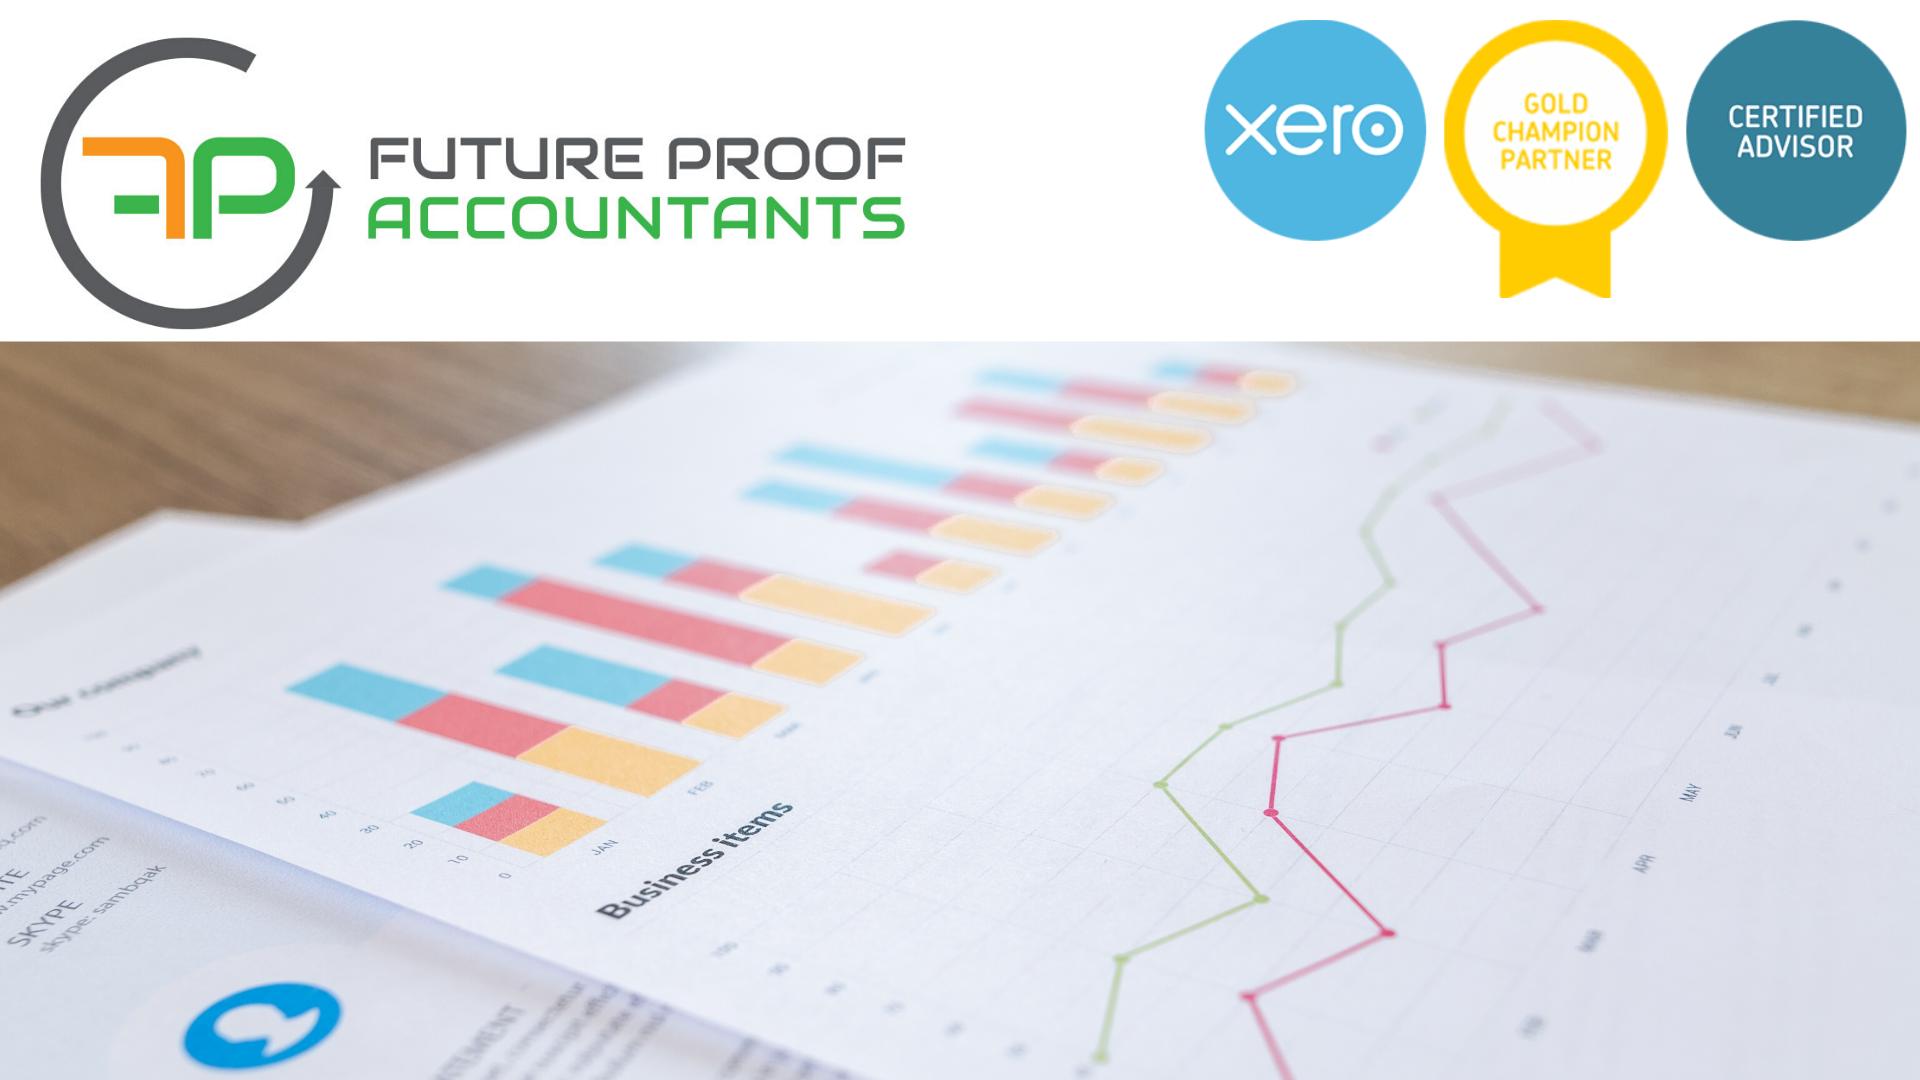 Creating Management Report Templates in Xero